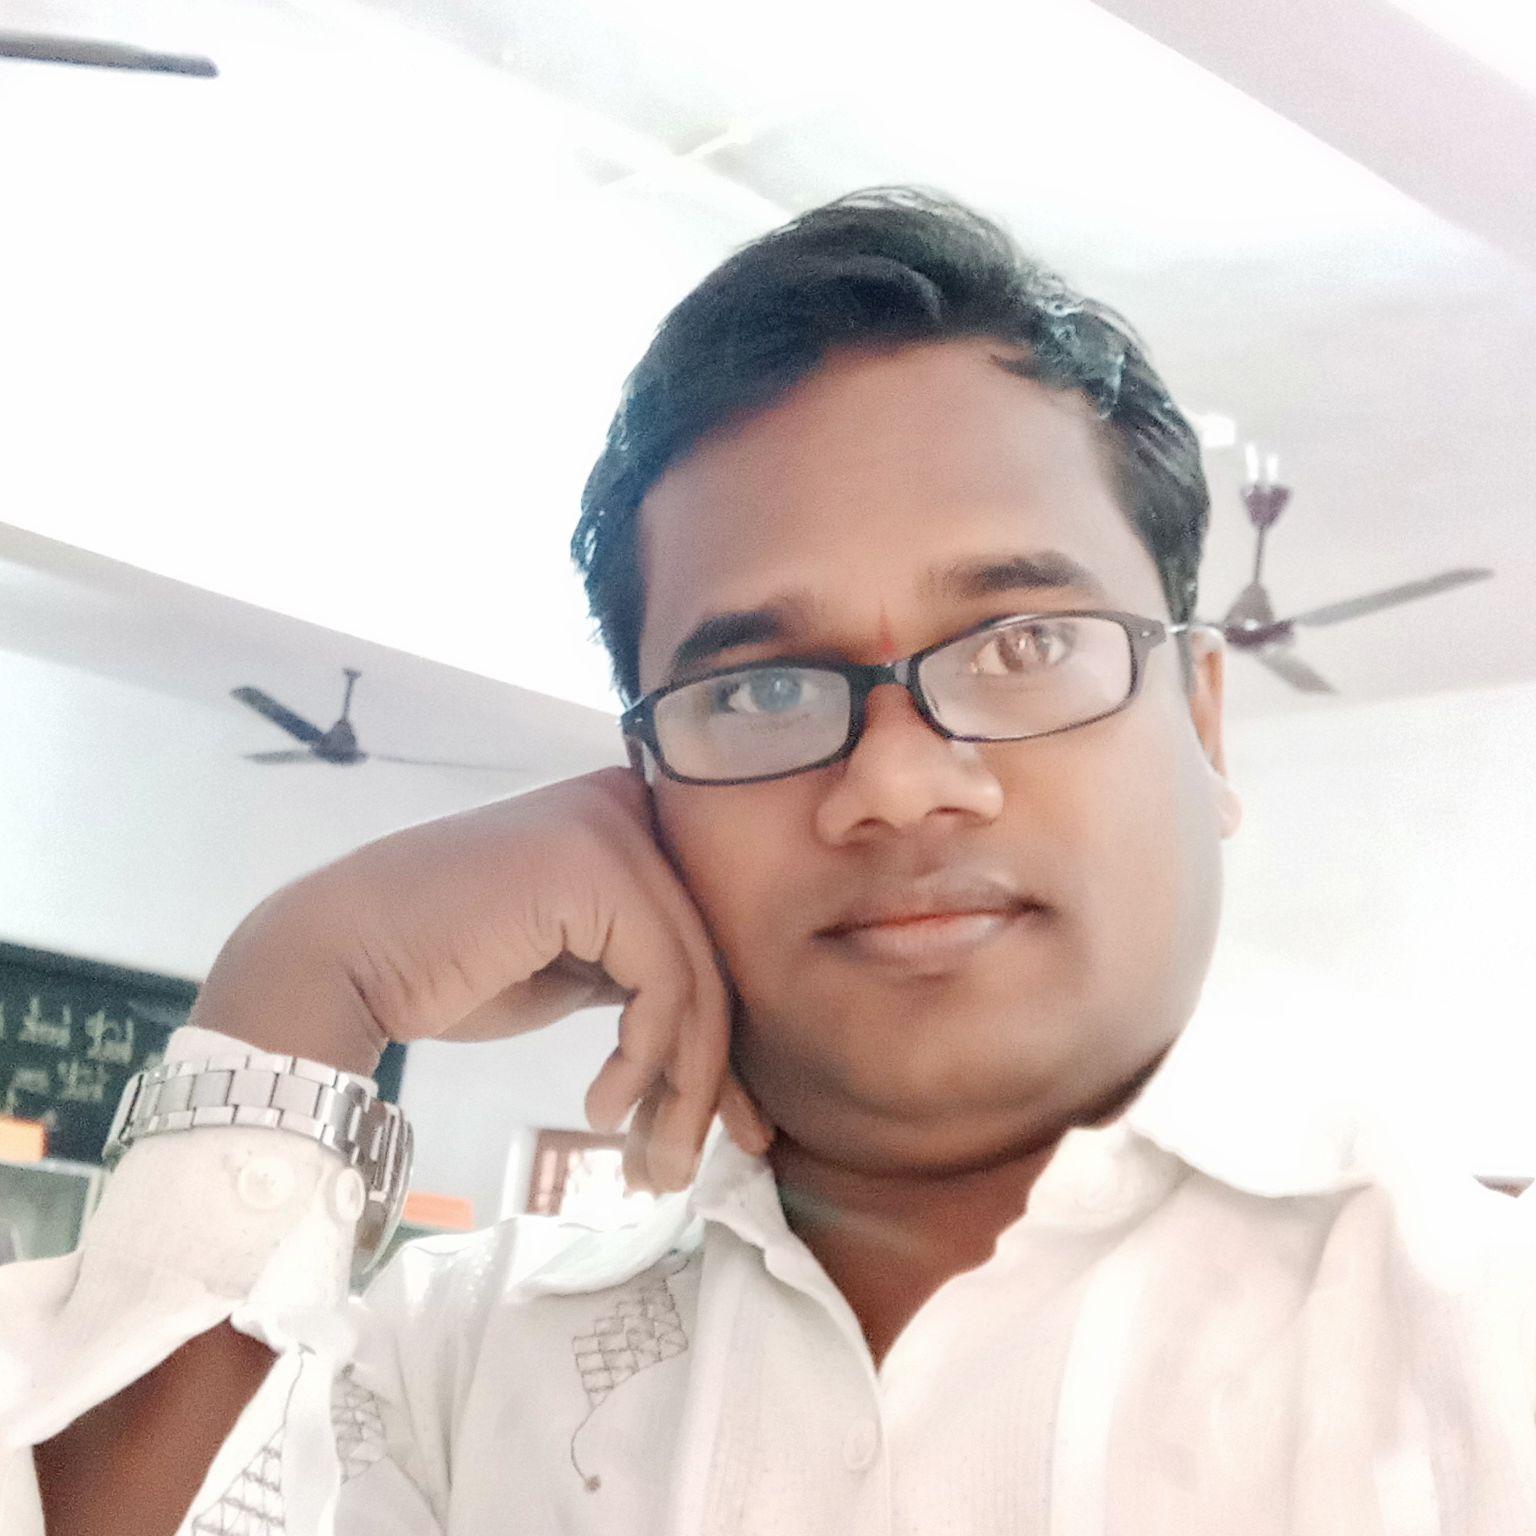 Bhupesh Kumar Sinhsar